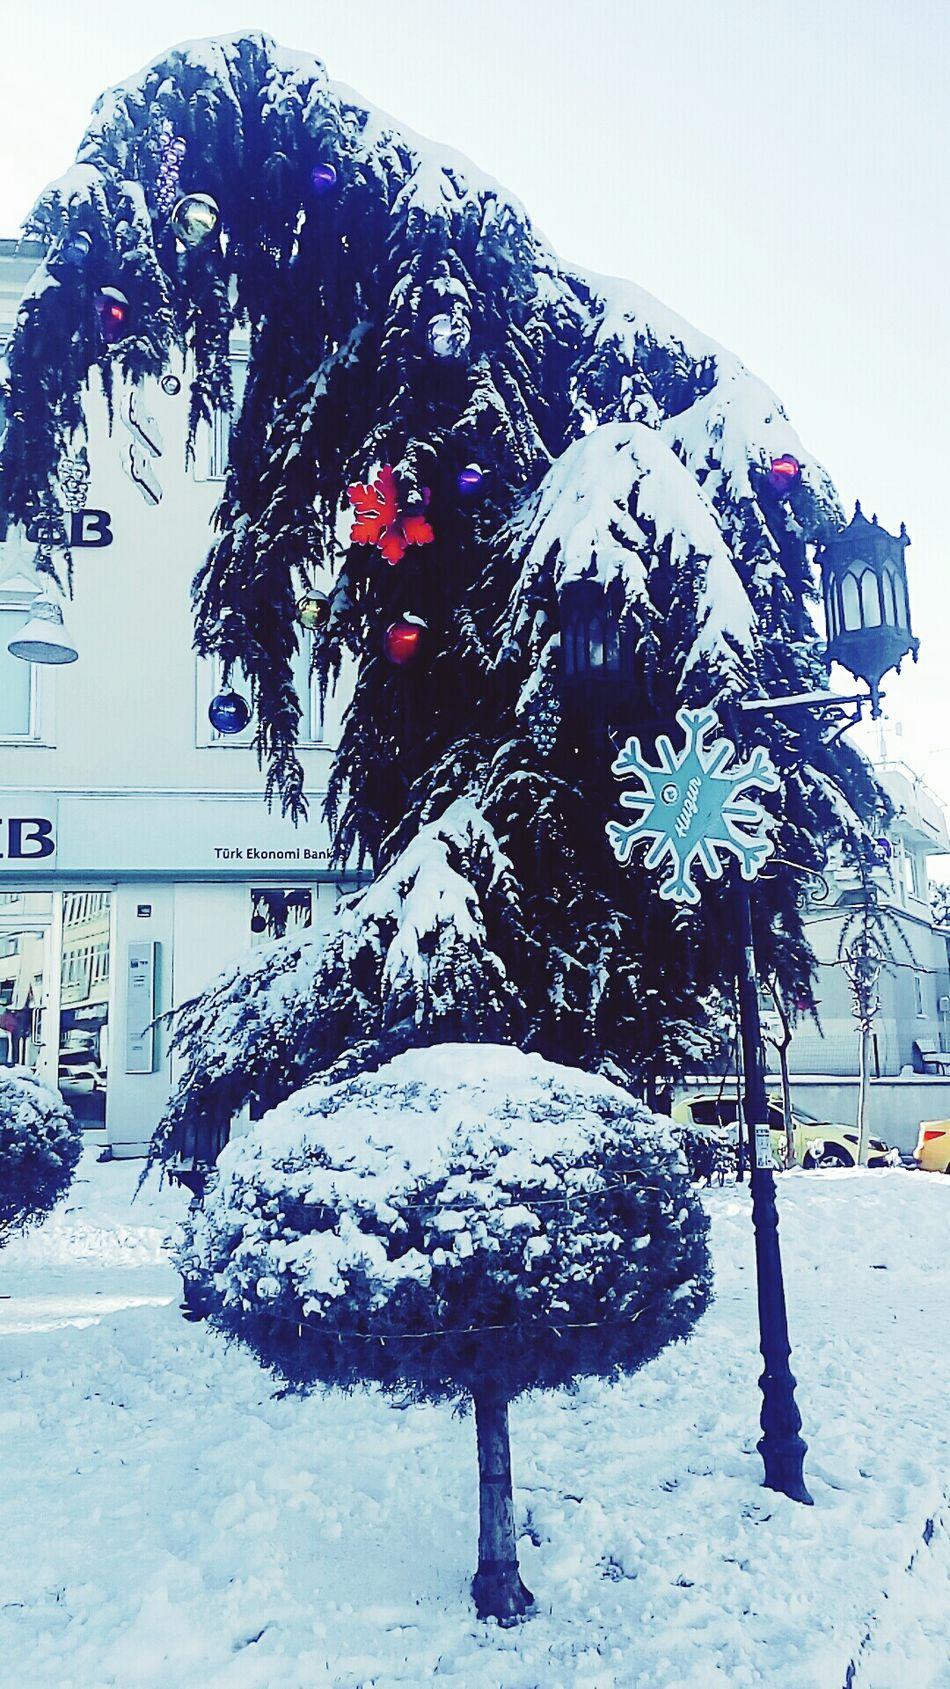 1.1.2017 Hi2017 Firstday Hellowinter Winterishere Winteriscoming Winterisalmostover Anewyear Noël Street Tree Agac Sokak Edirne YeniYıl Kış Ilkgun Withboyfriend White Beyaz